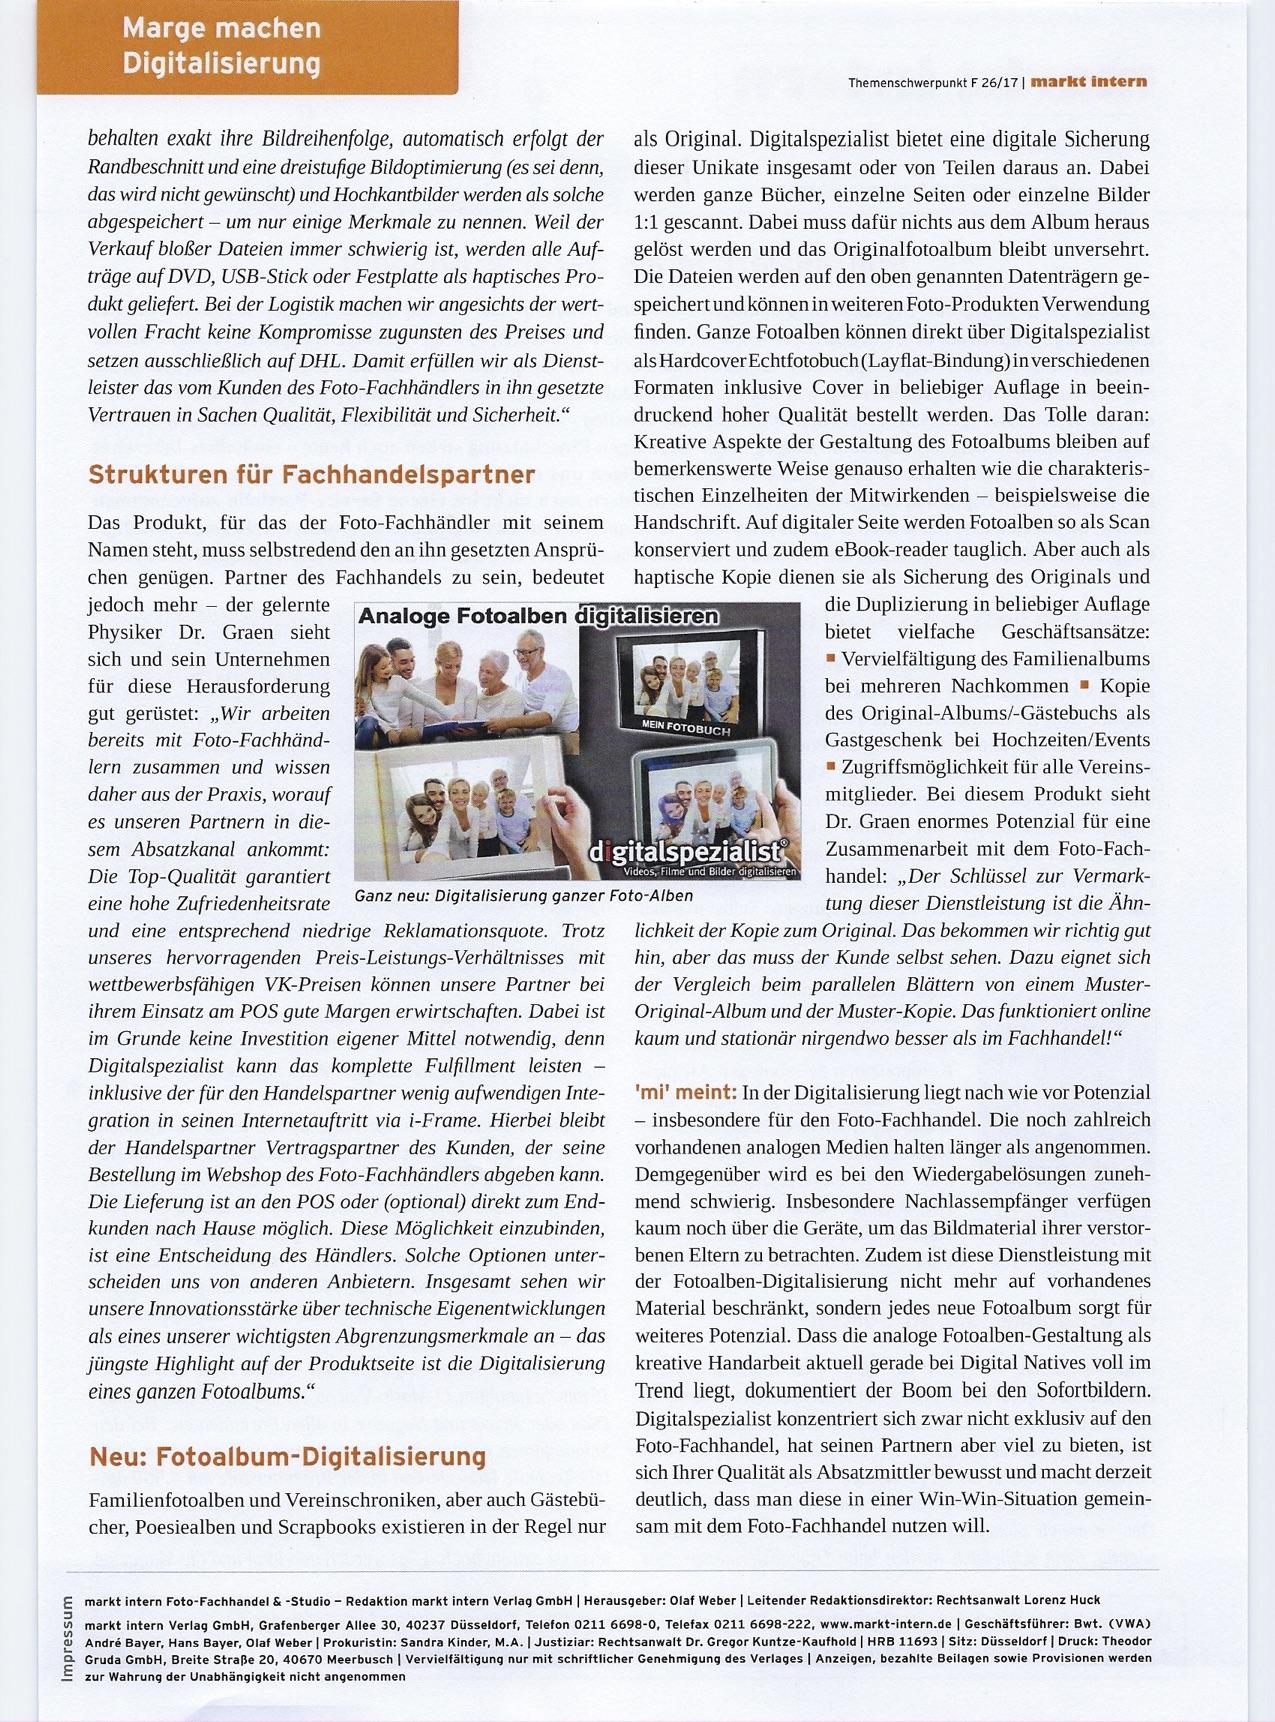 201707_Marktintern-Artikel_2